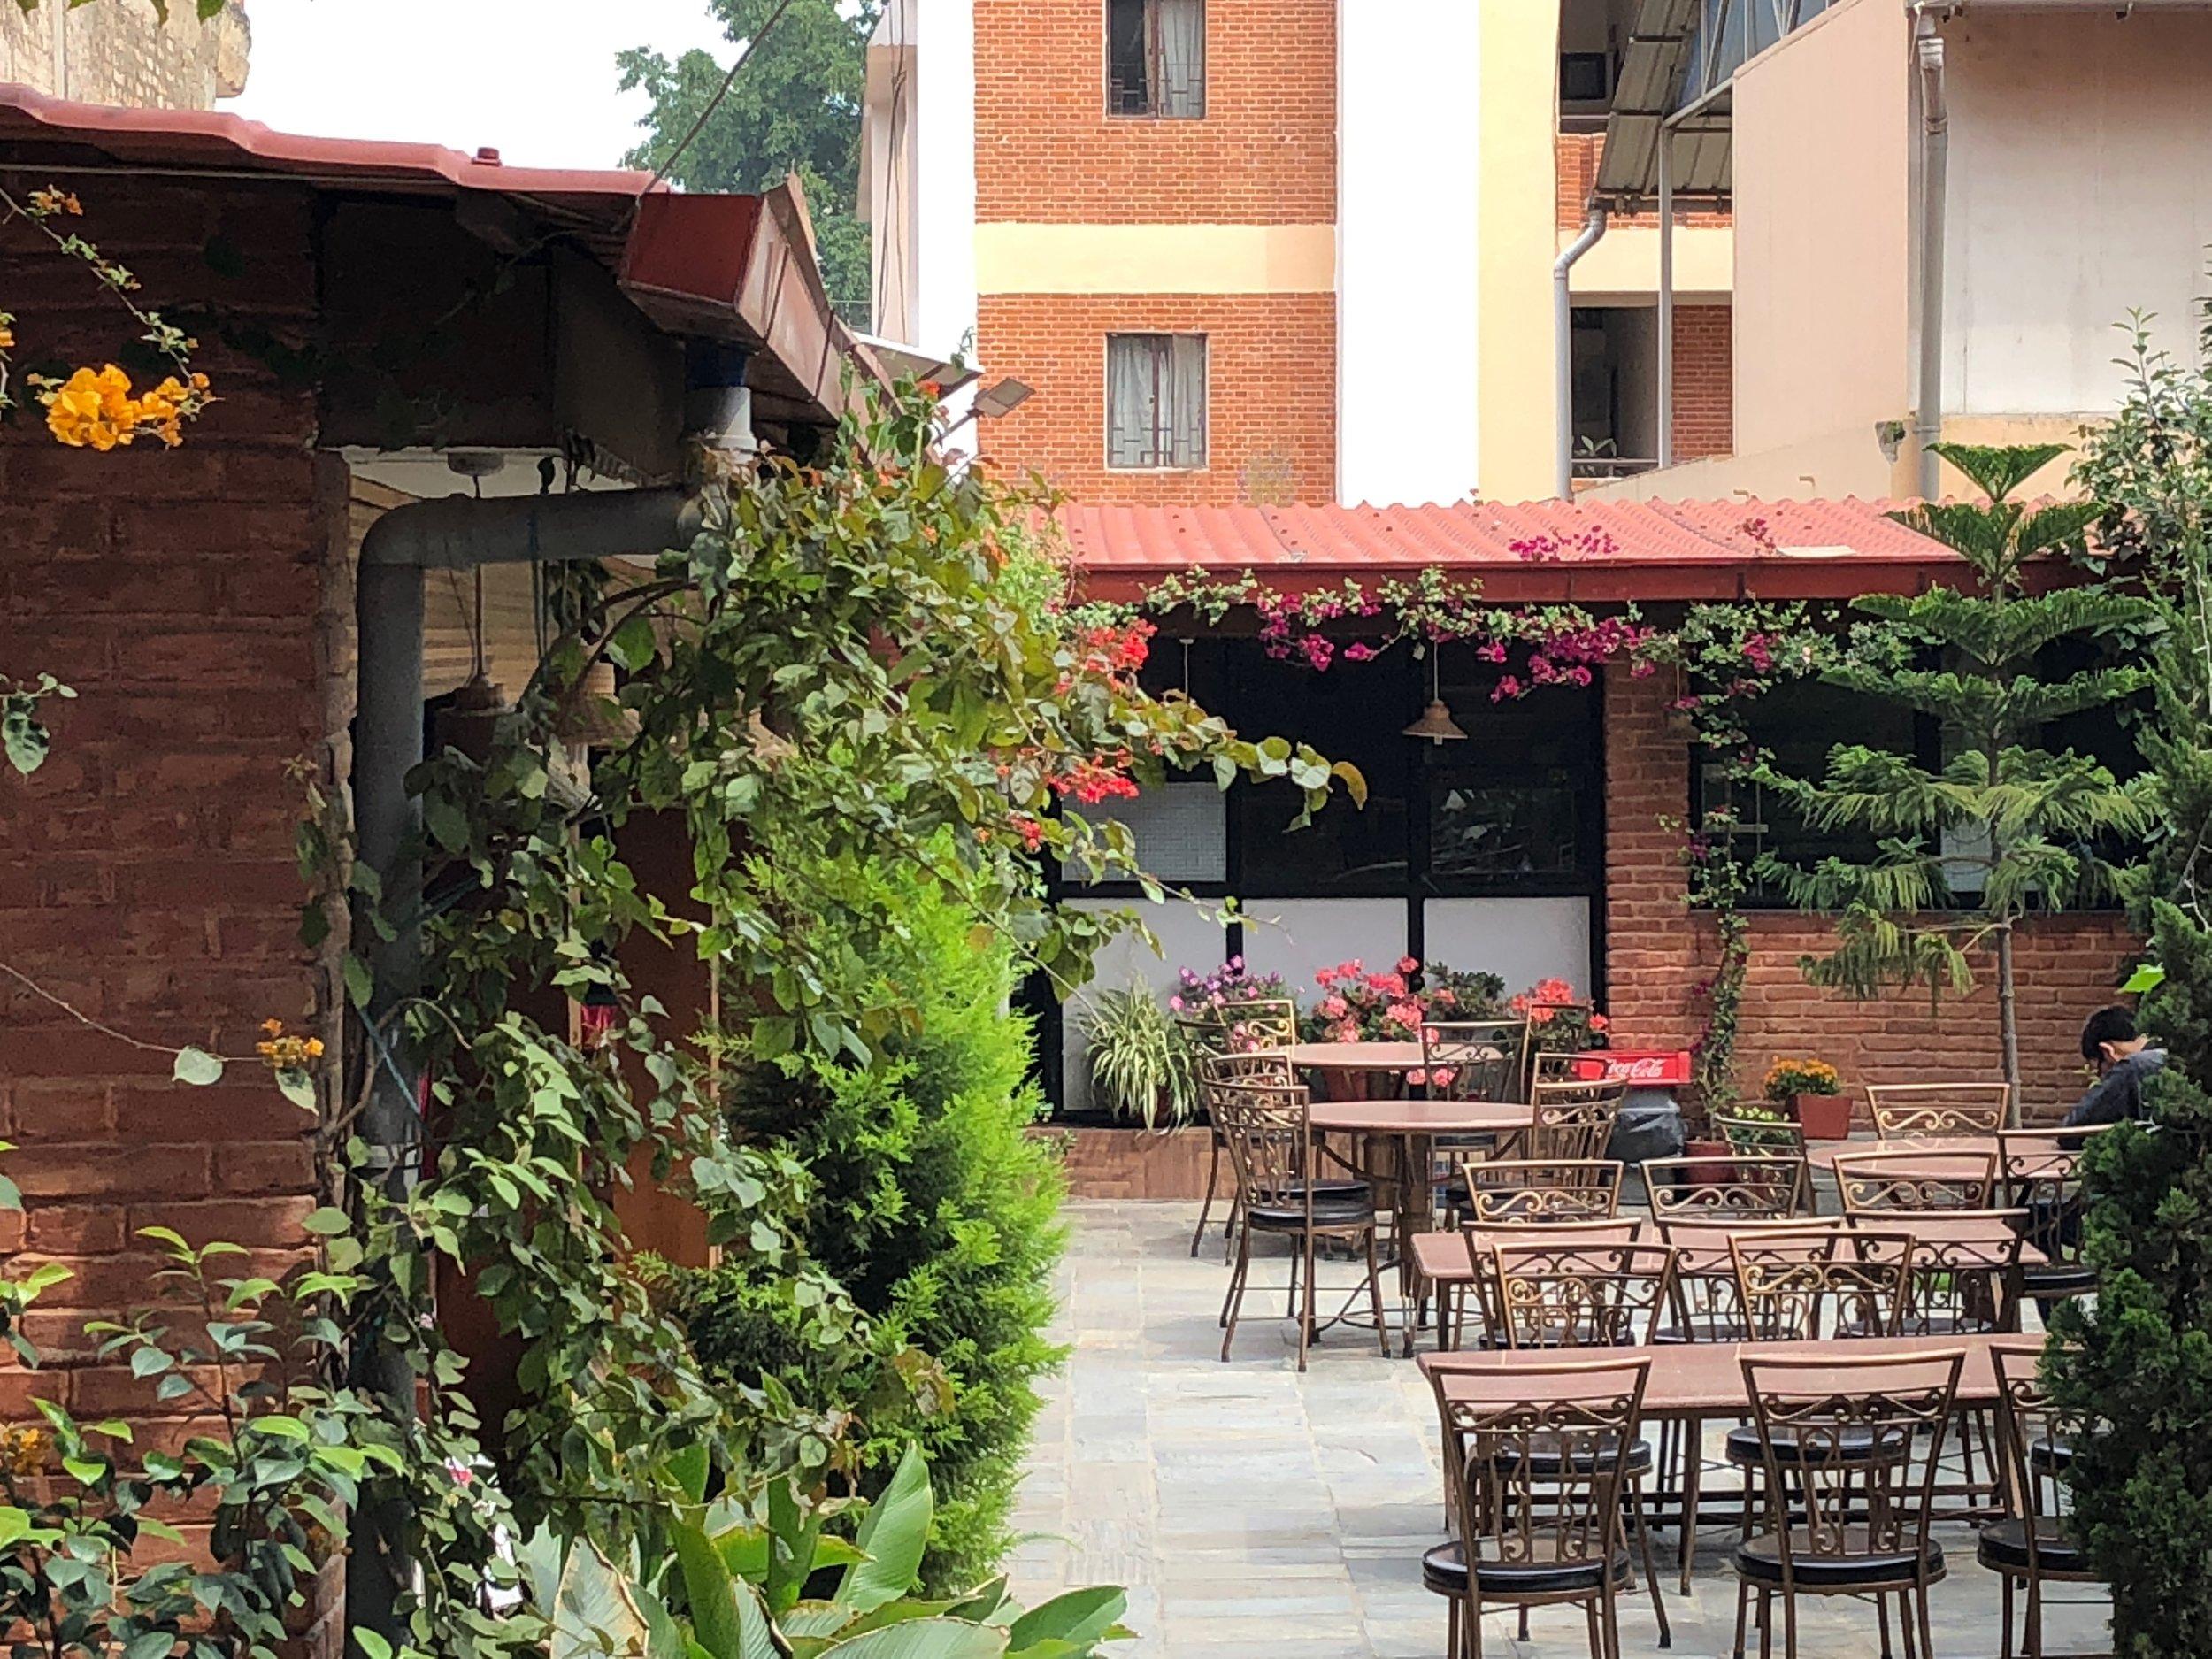 hotel_apsara_courtyard.jpg